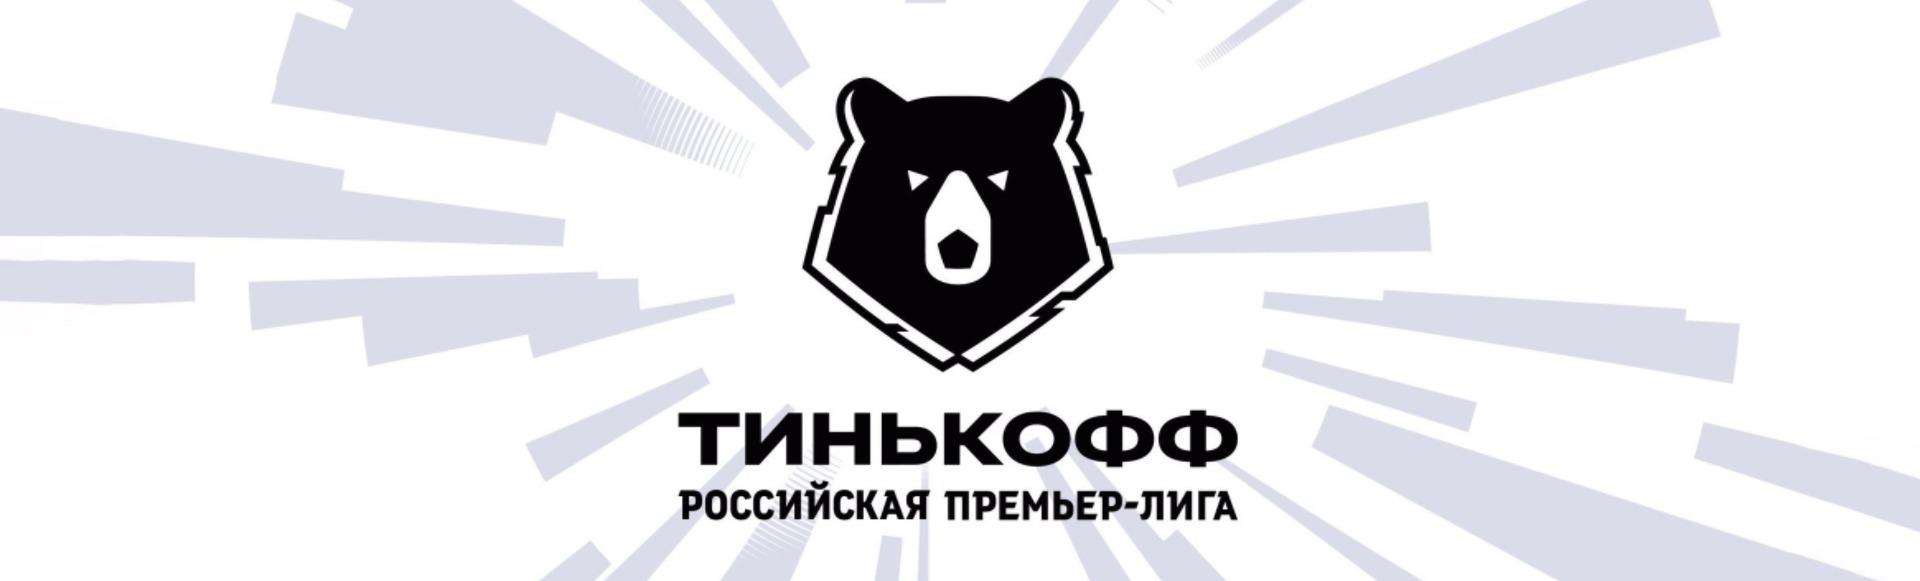 Футбол Уфа - Ротор 3.10.2020 смотреть онлайн